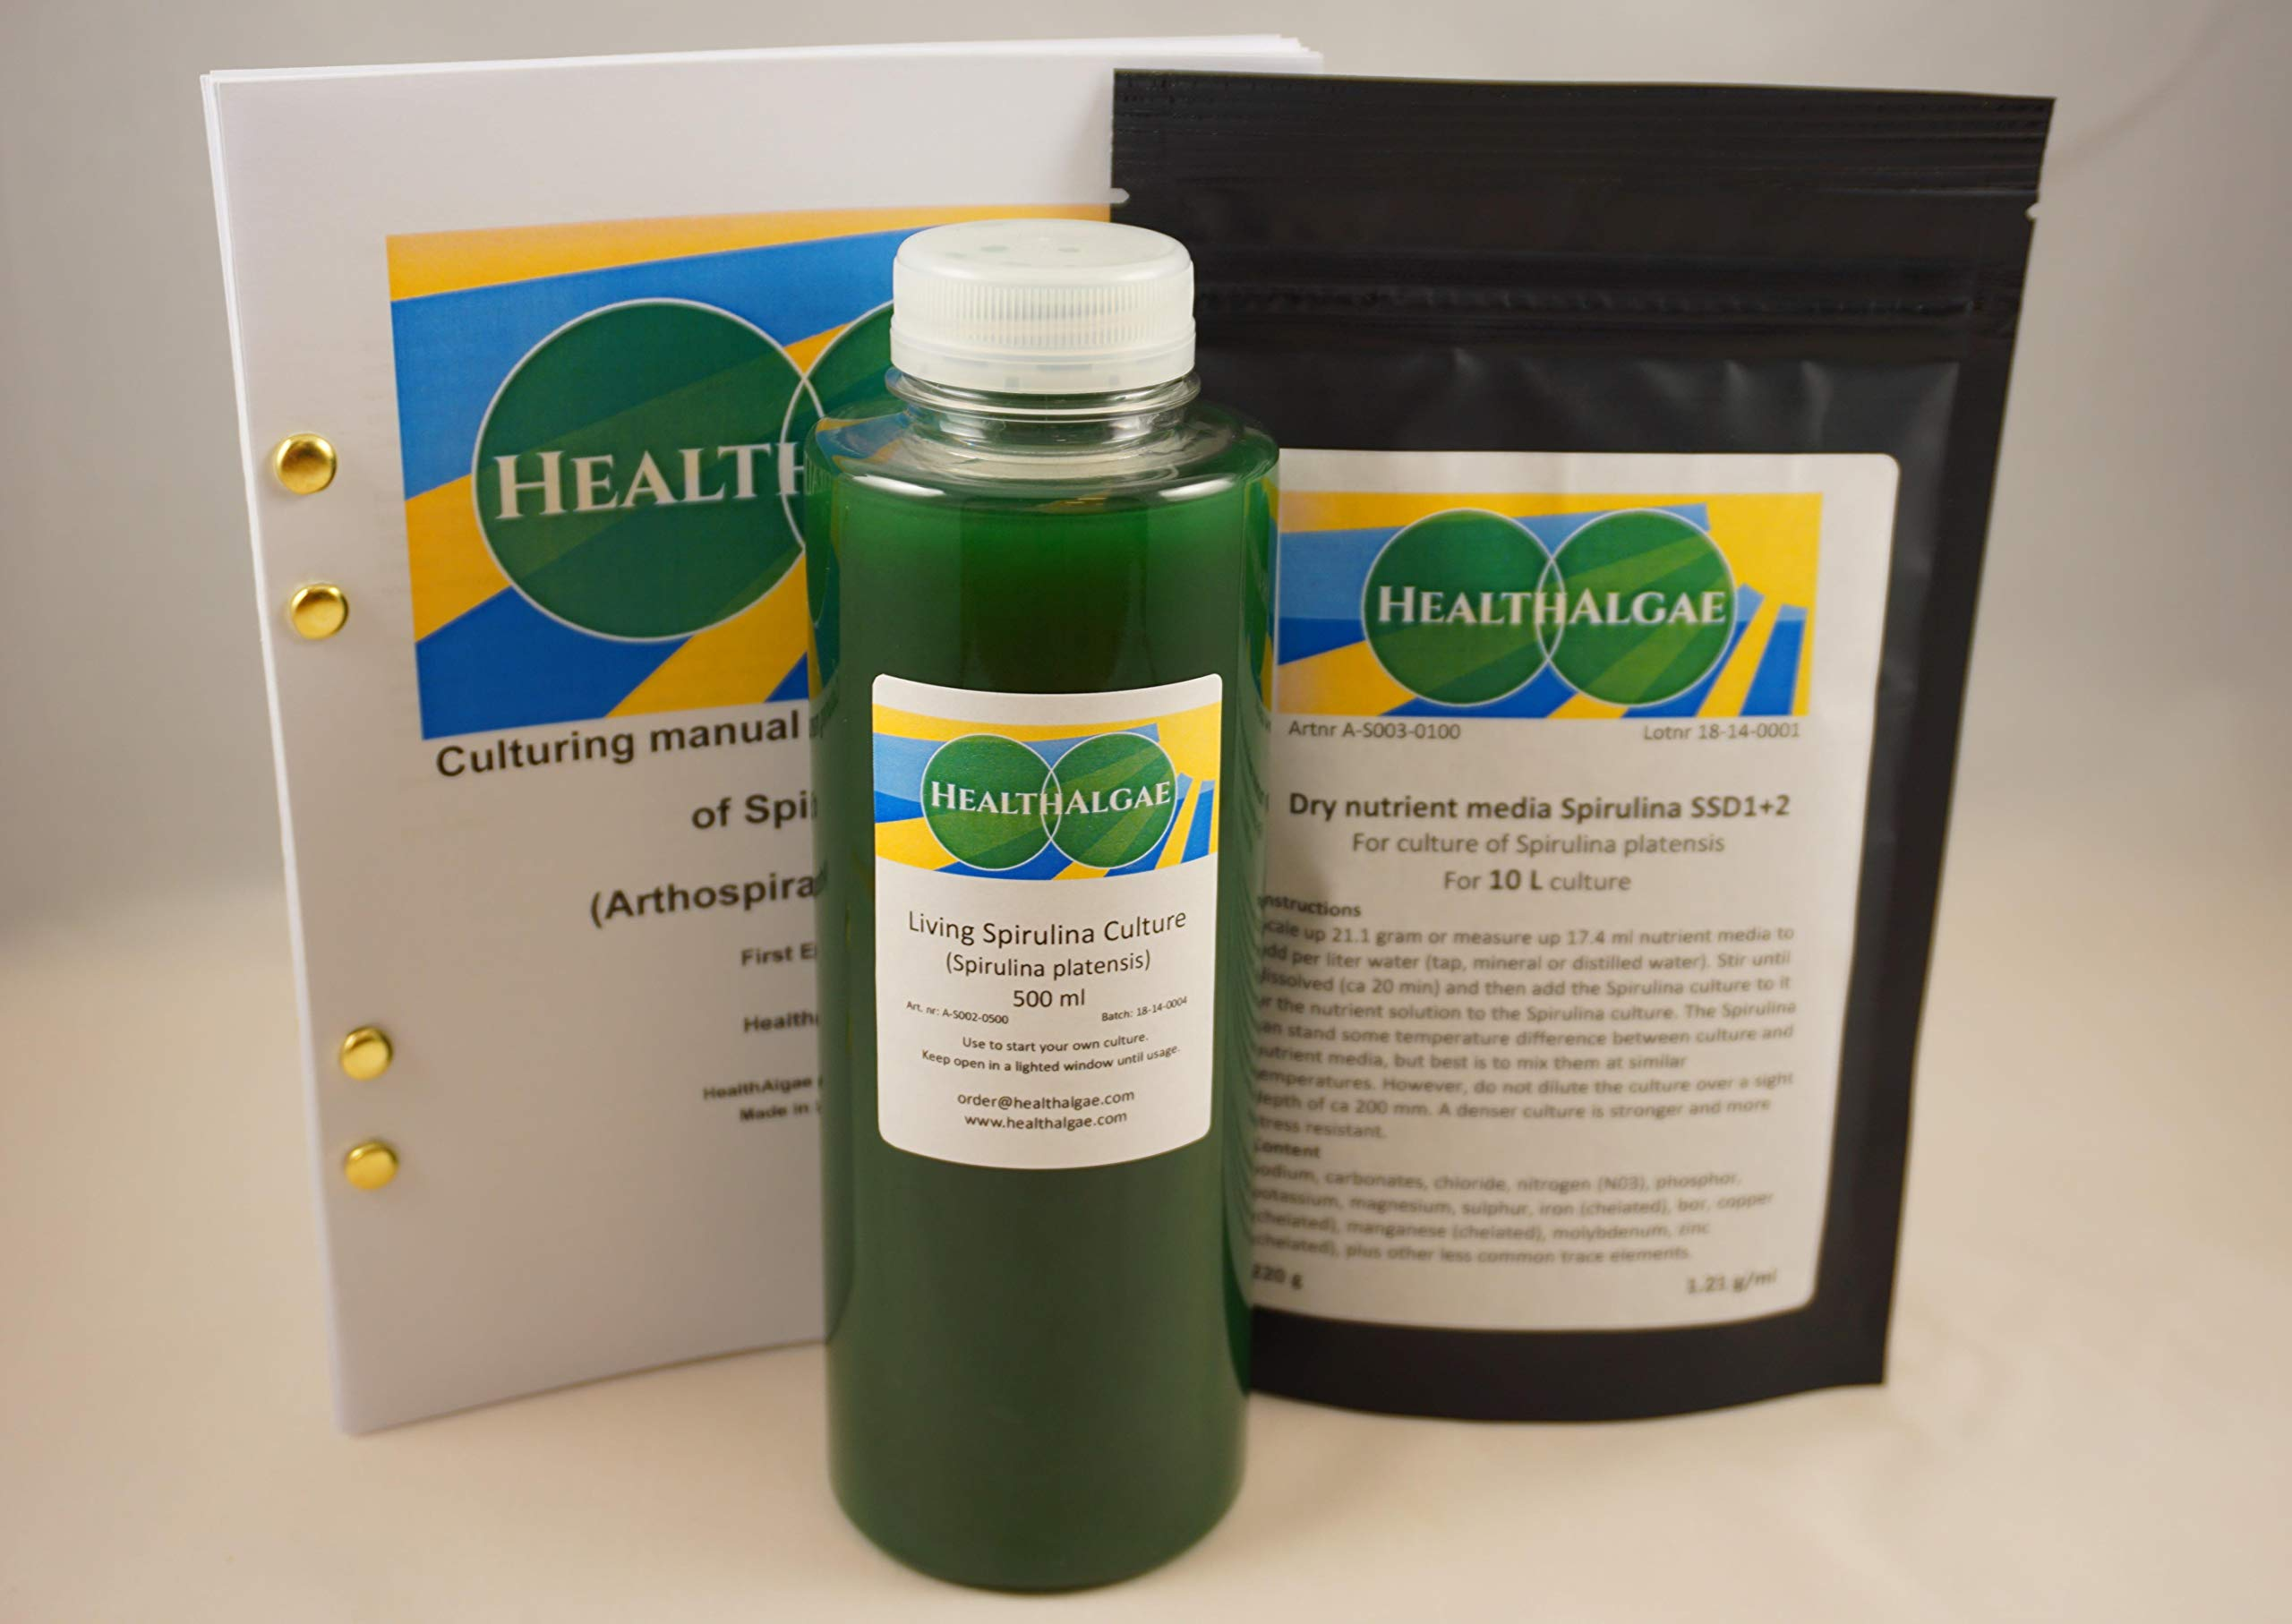 Live Spirulina platensis (500 ml) + 10 L Dry Spirulina Grow Medium SSD1+2 - Algae Culture + fertlizer (500ml 10L)